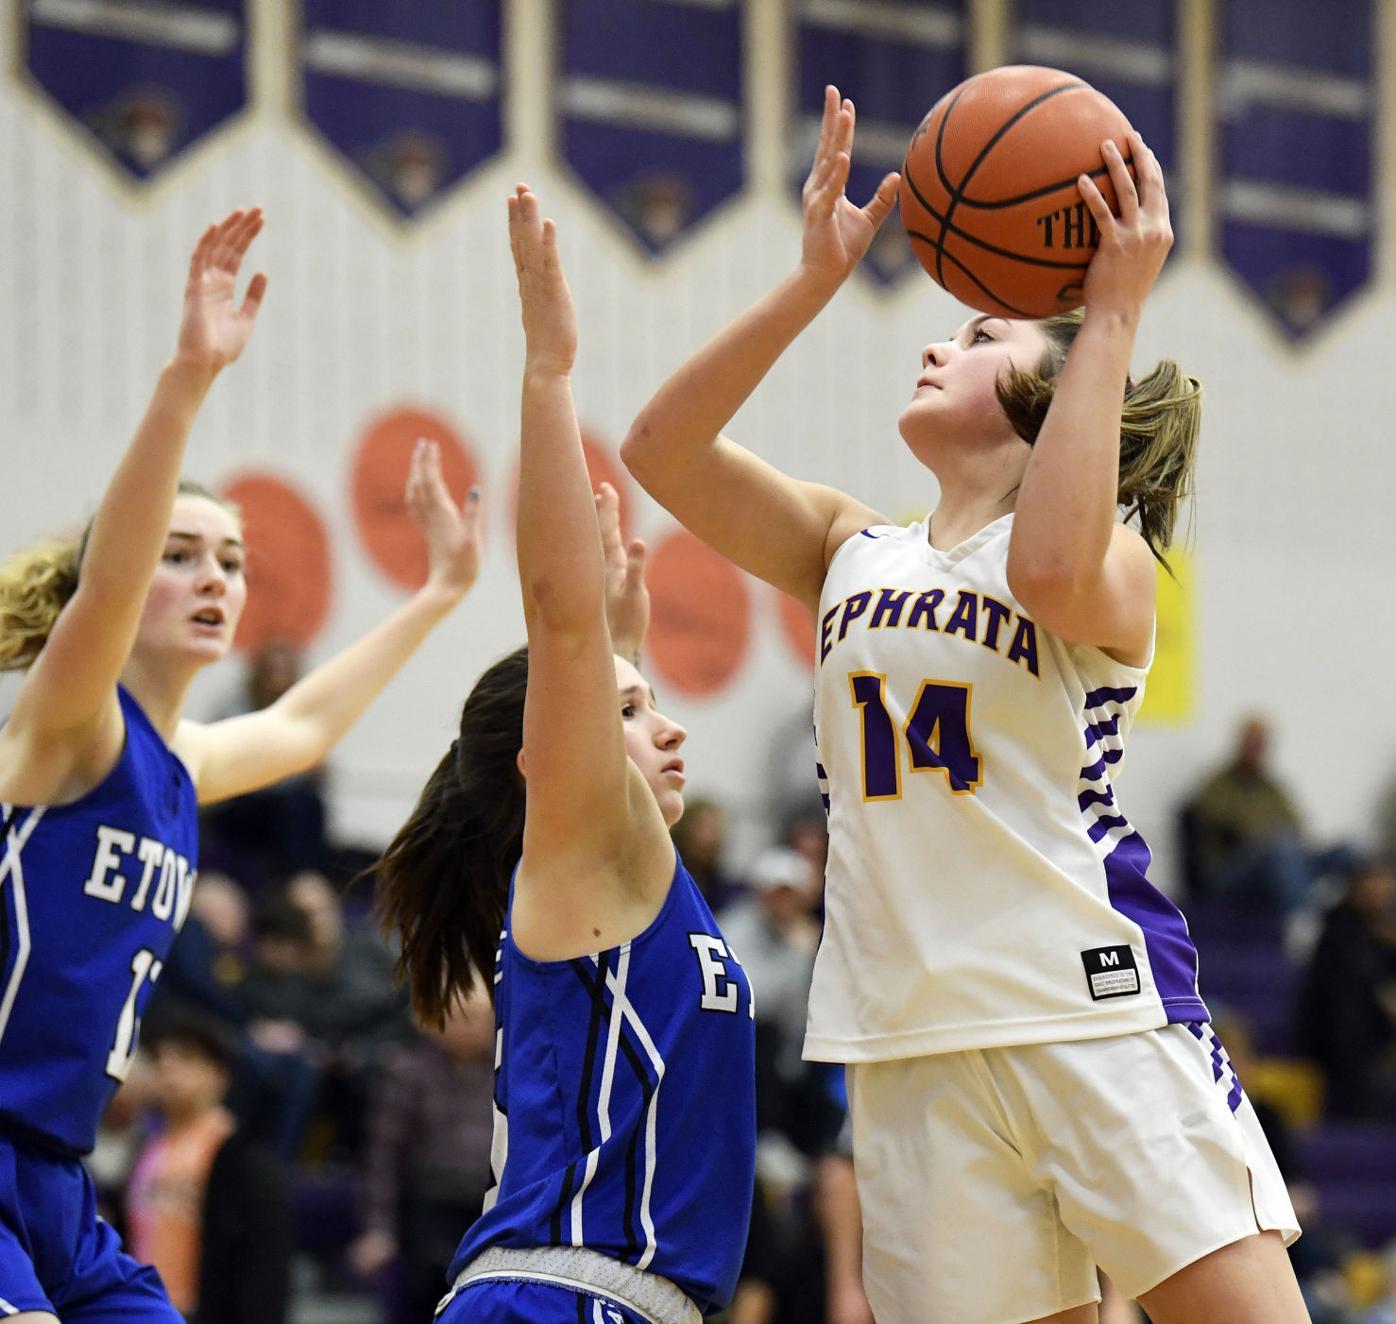 Ephrata vs Elizabethtown-LL Girls Basketball